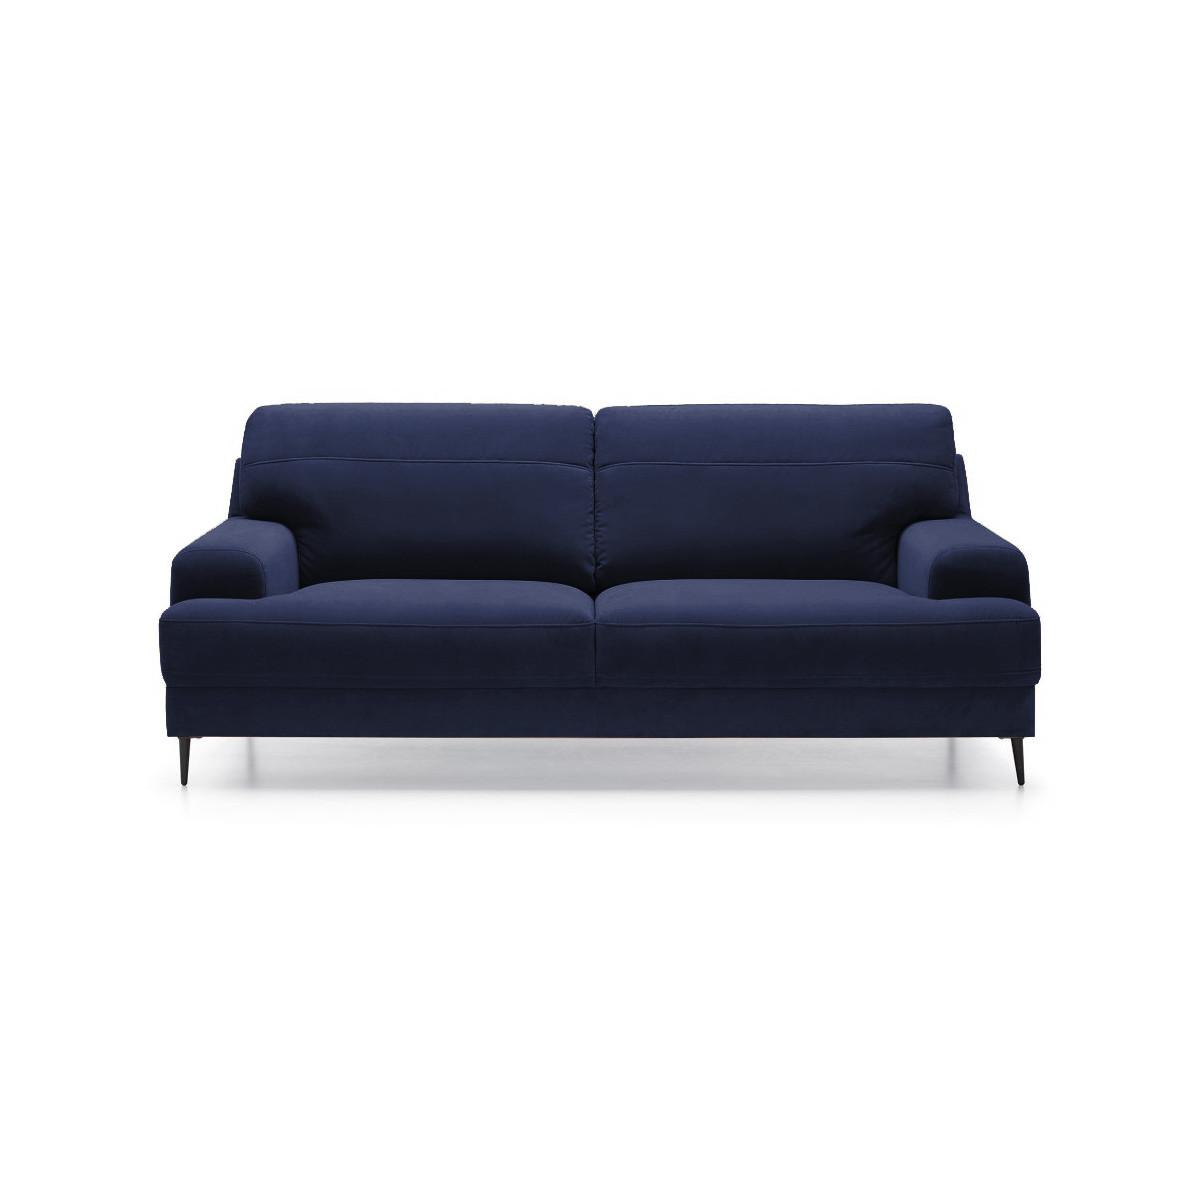 Monday Sofa 3 207cm